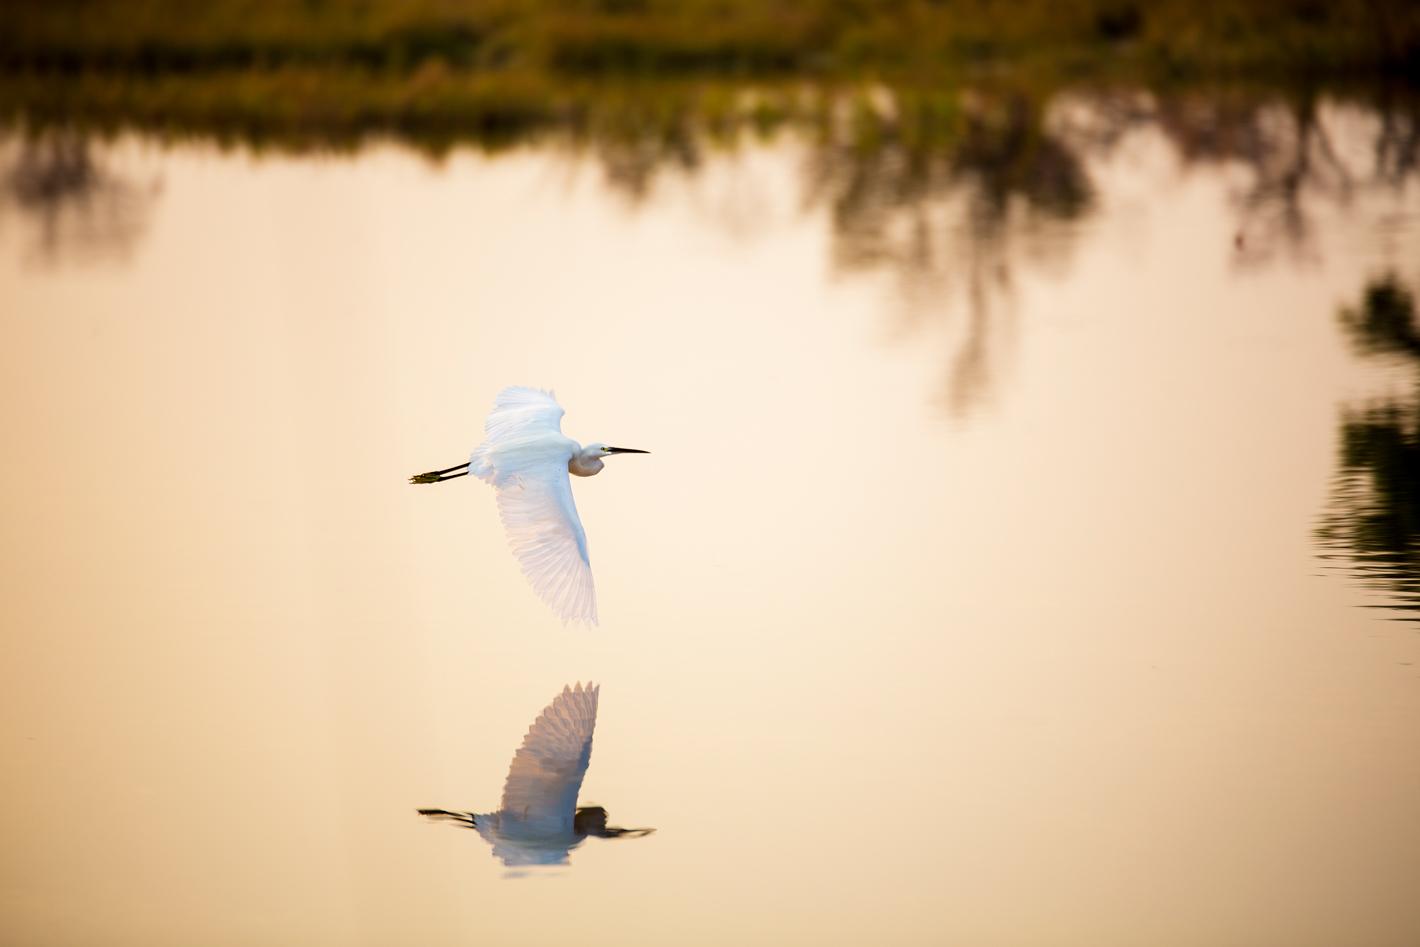 bird silhouette on wetland